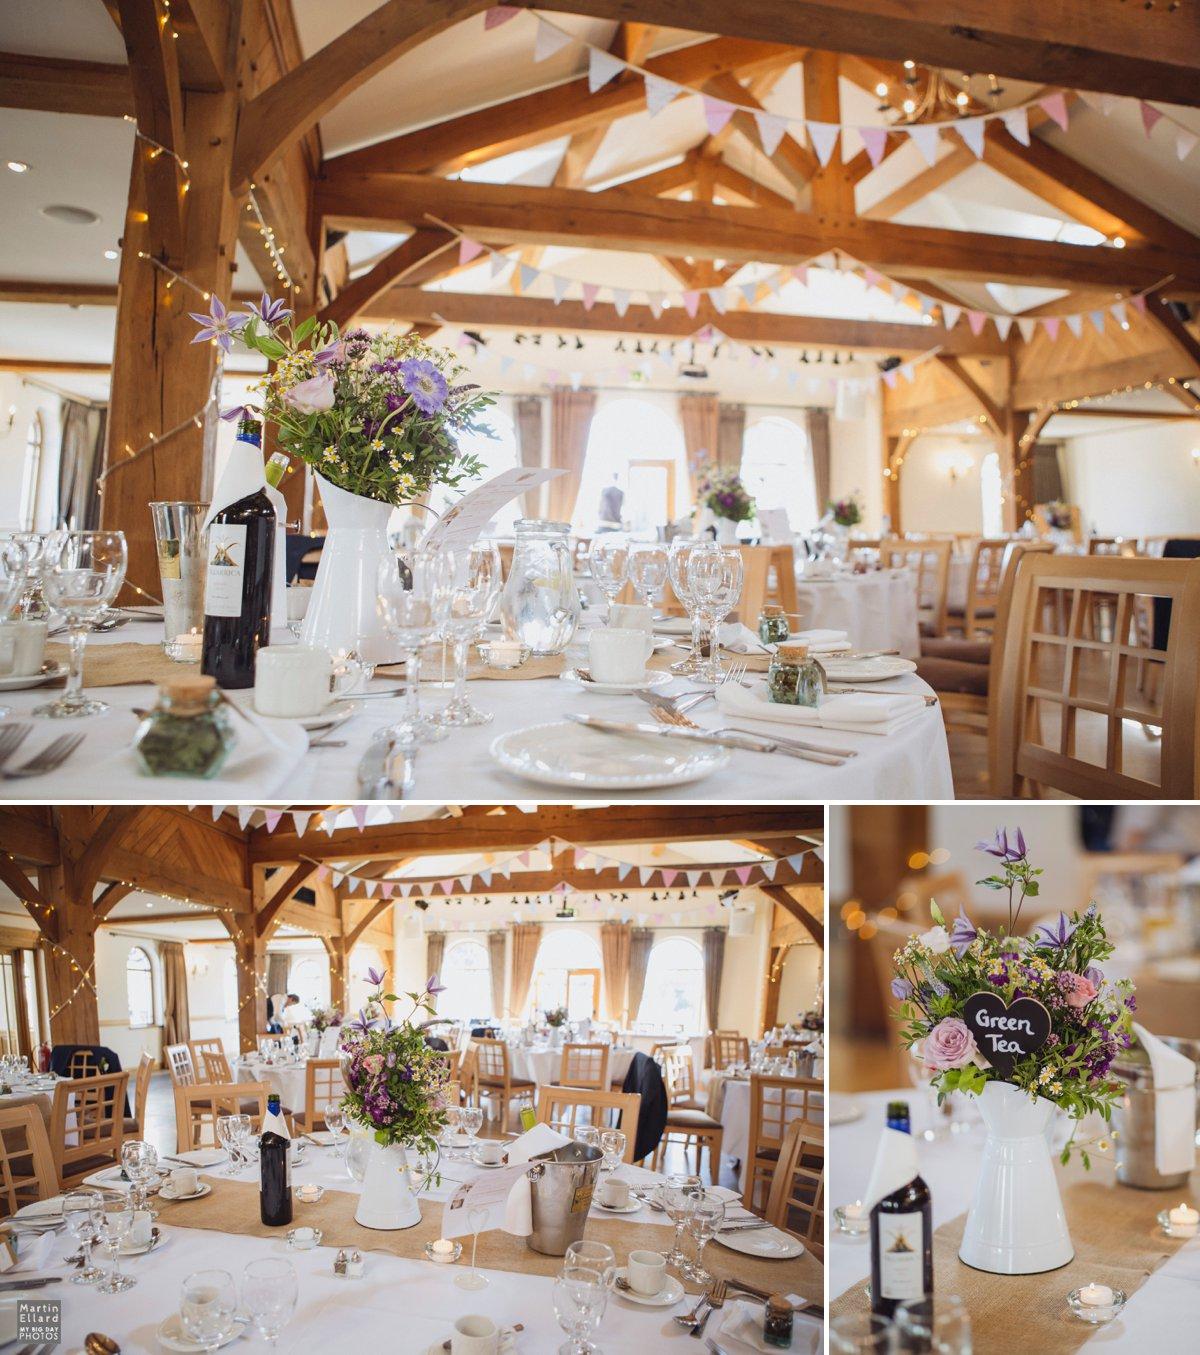 The King Arthur Hotel rustic wedding style